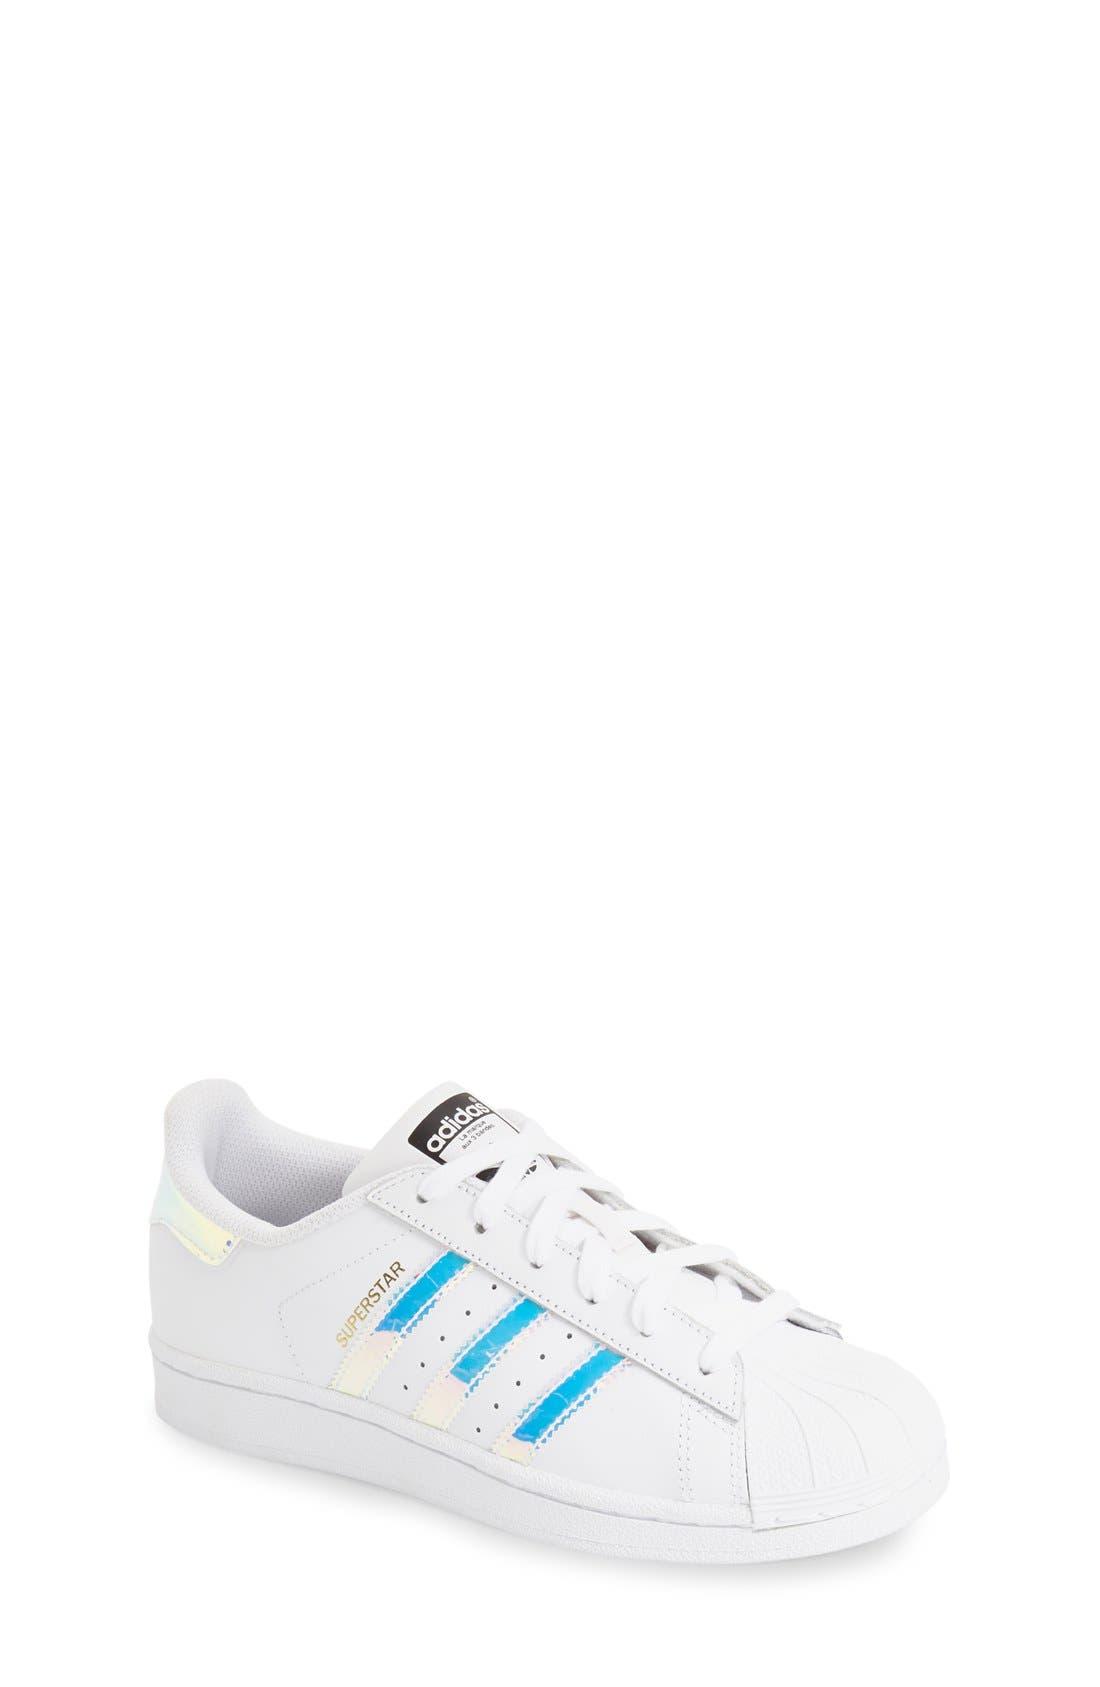 Superstar - Iridescent Sneaker,                         Main,                         color, SILVER METALLIC/ WHITE